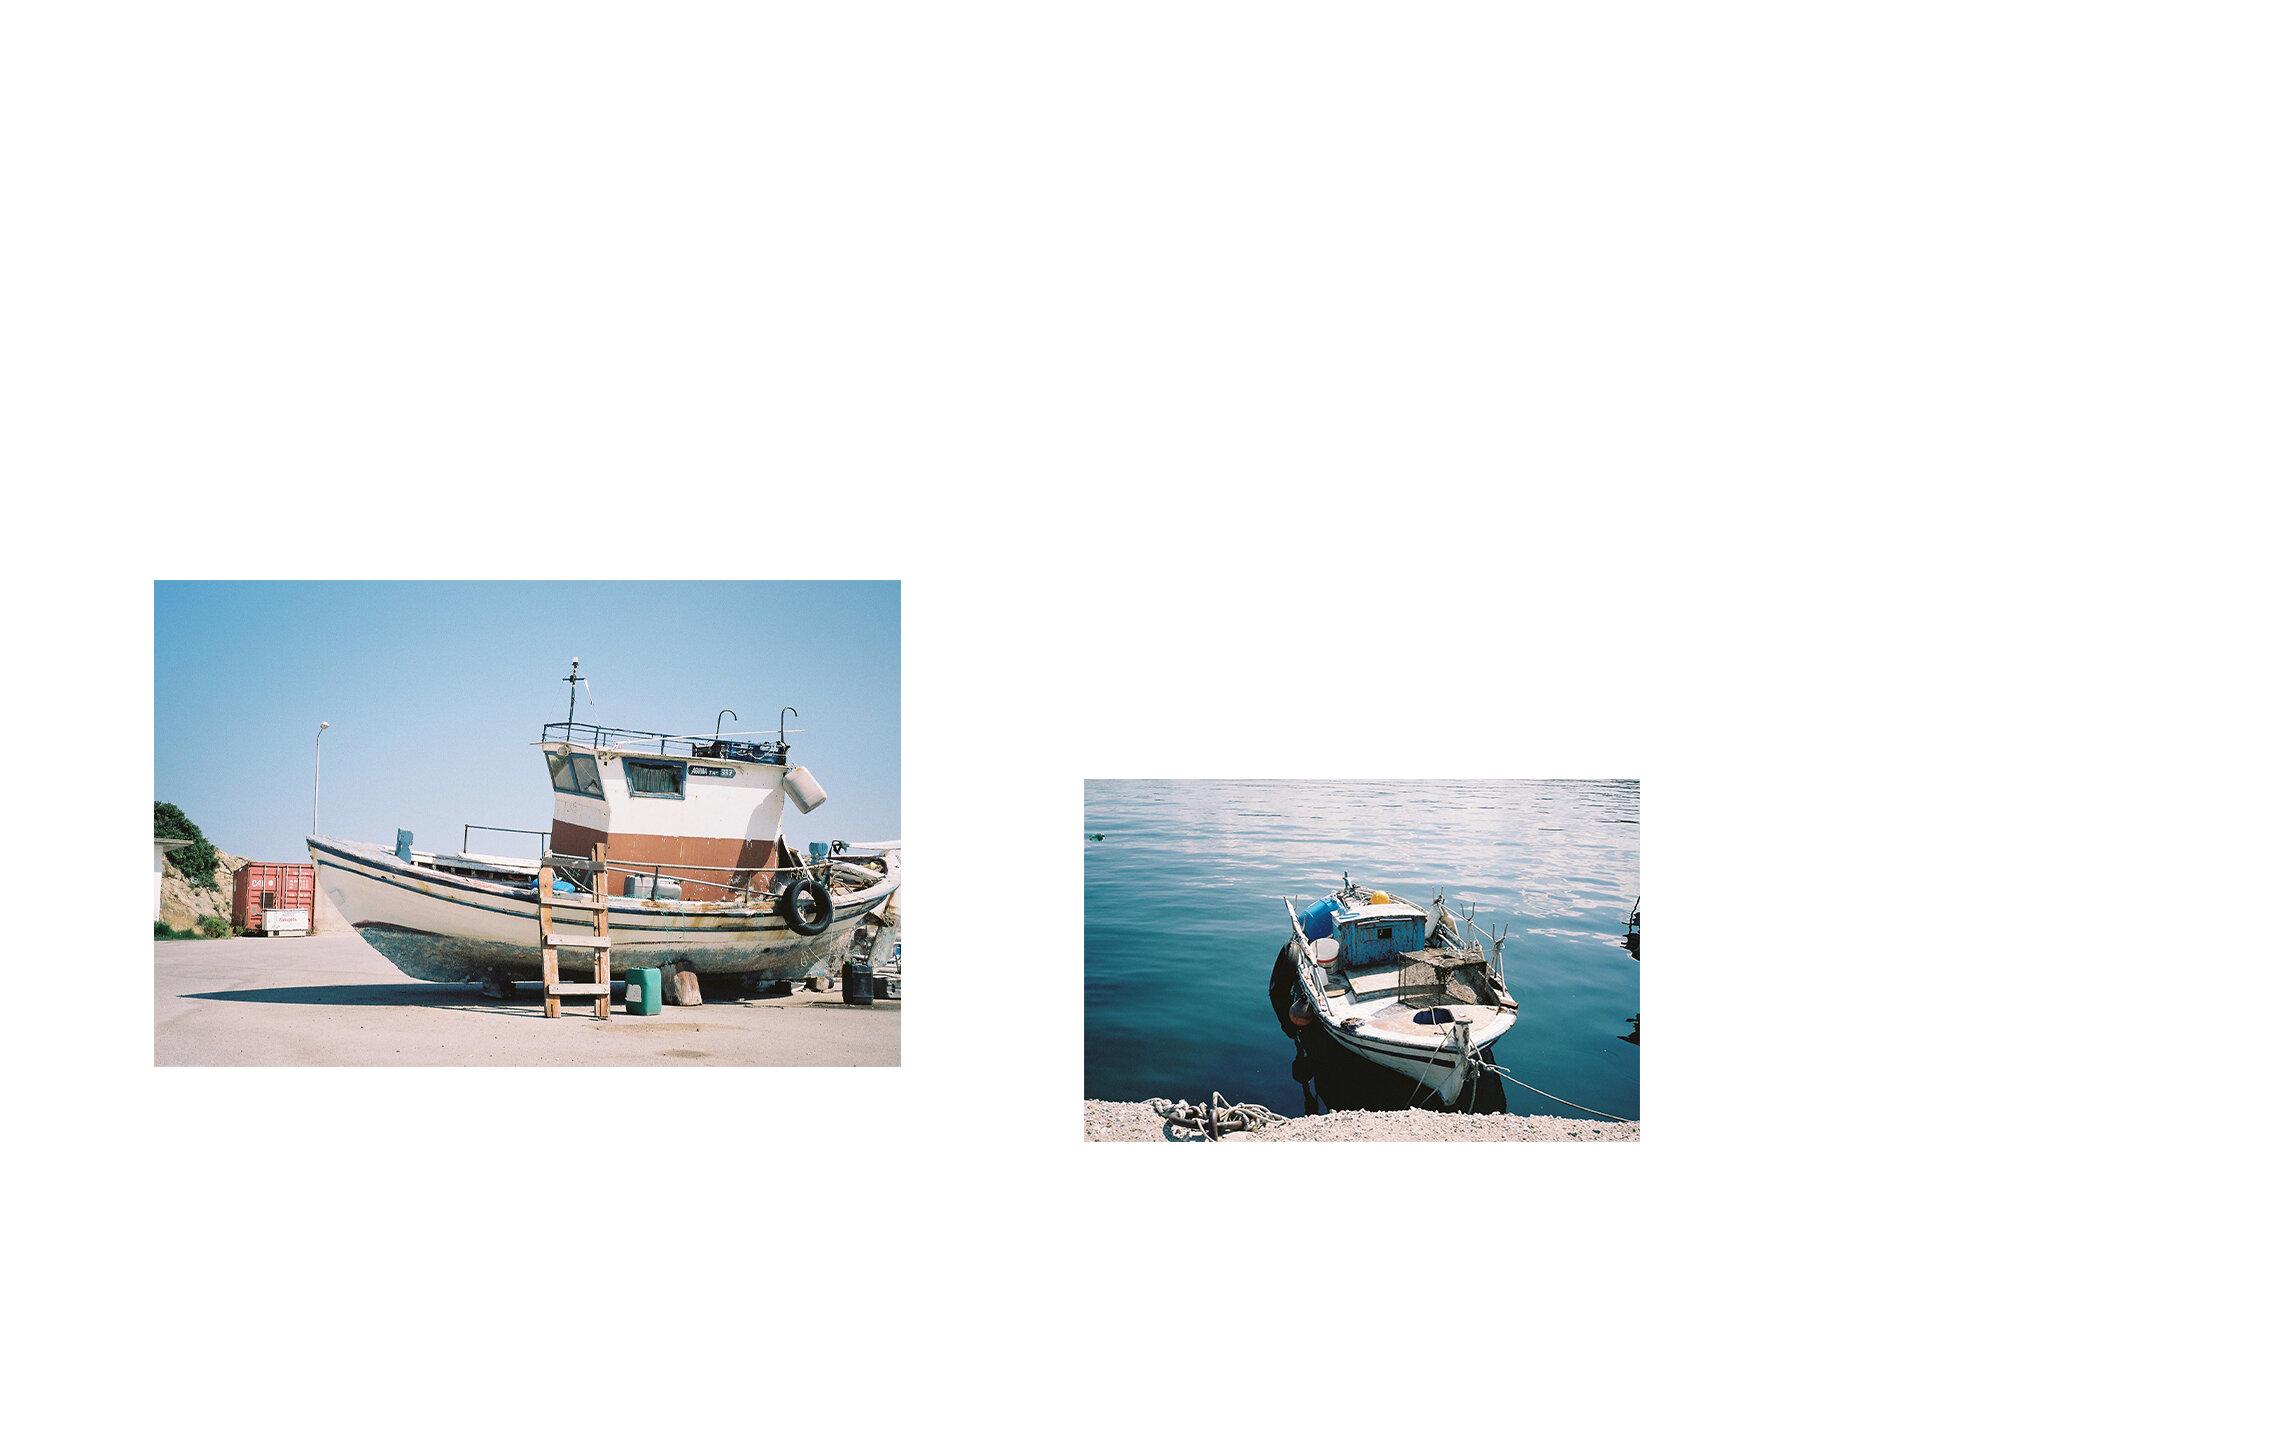 toby-butler-photo-tobybutlerphoto-lifestylephotography-travel-travelphotography-lifestyle-tourism-greece-film-35mm-magazine-europe-mediterranean-ocean-8.jpg